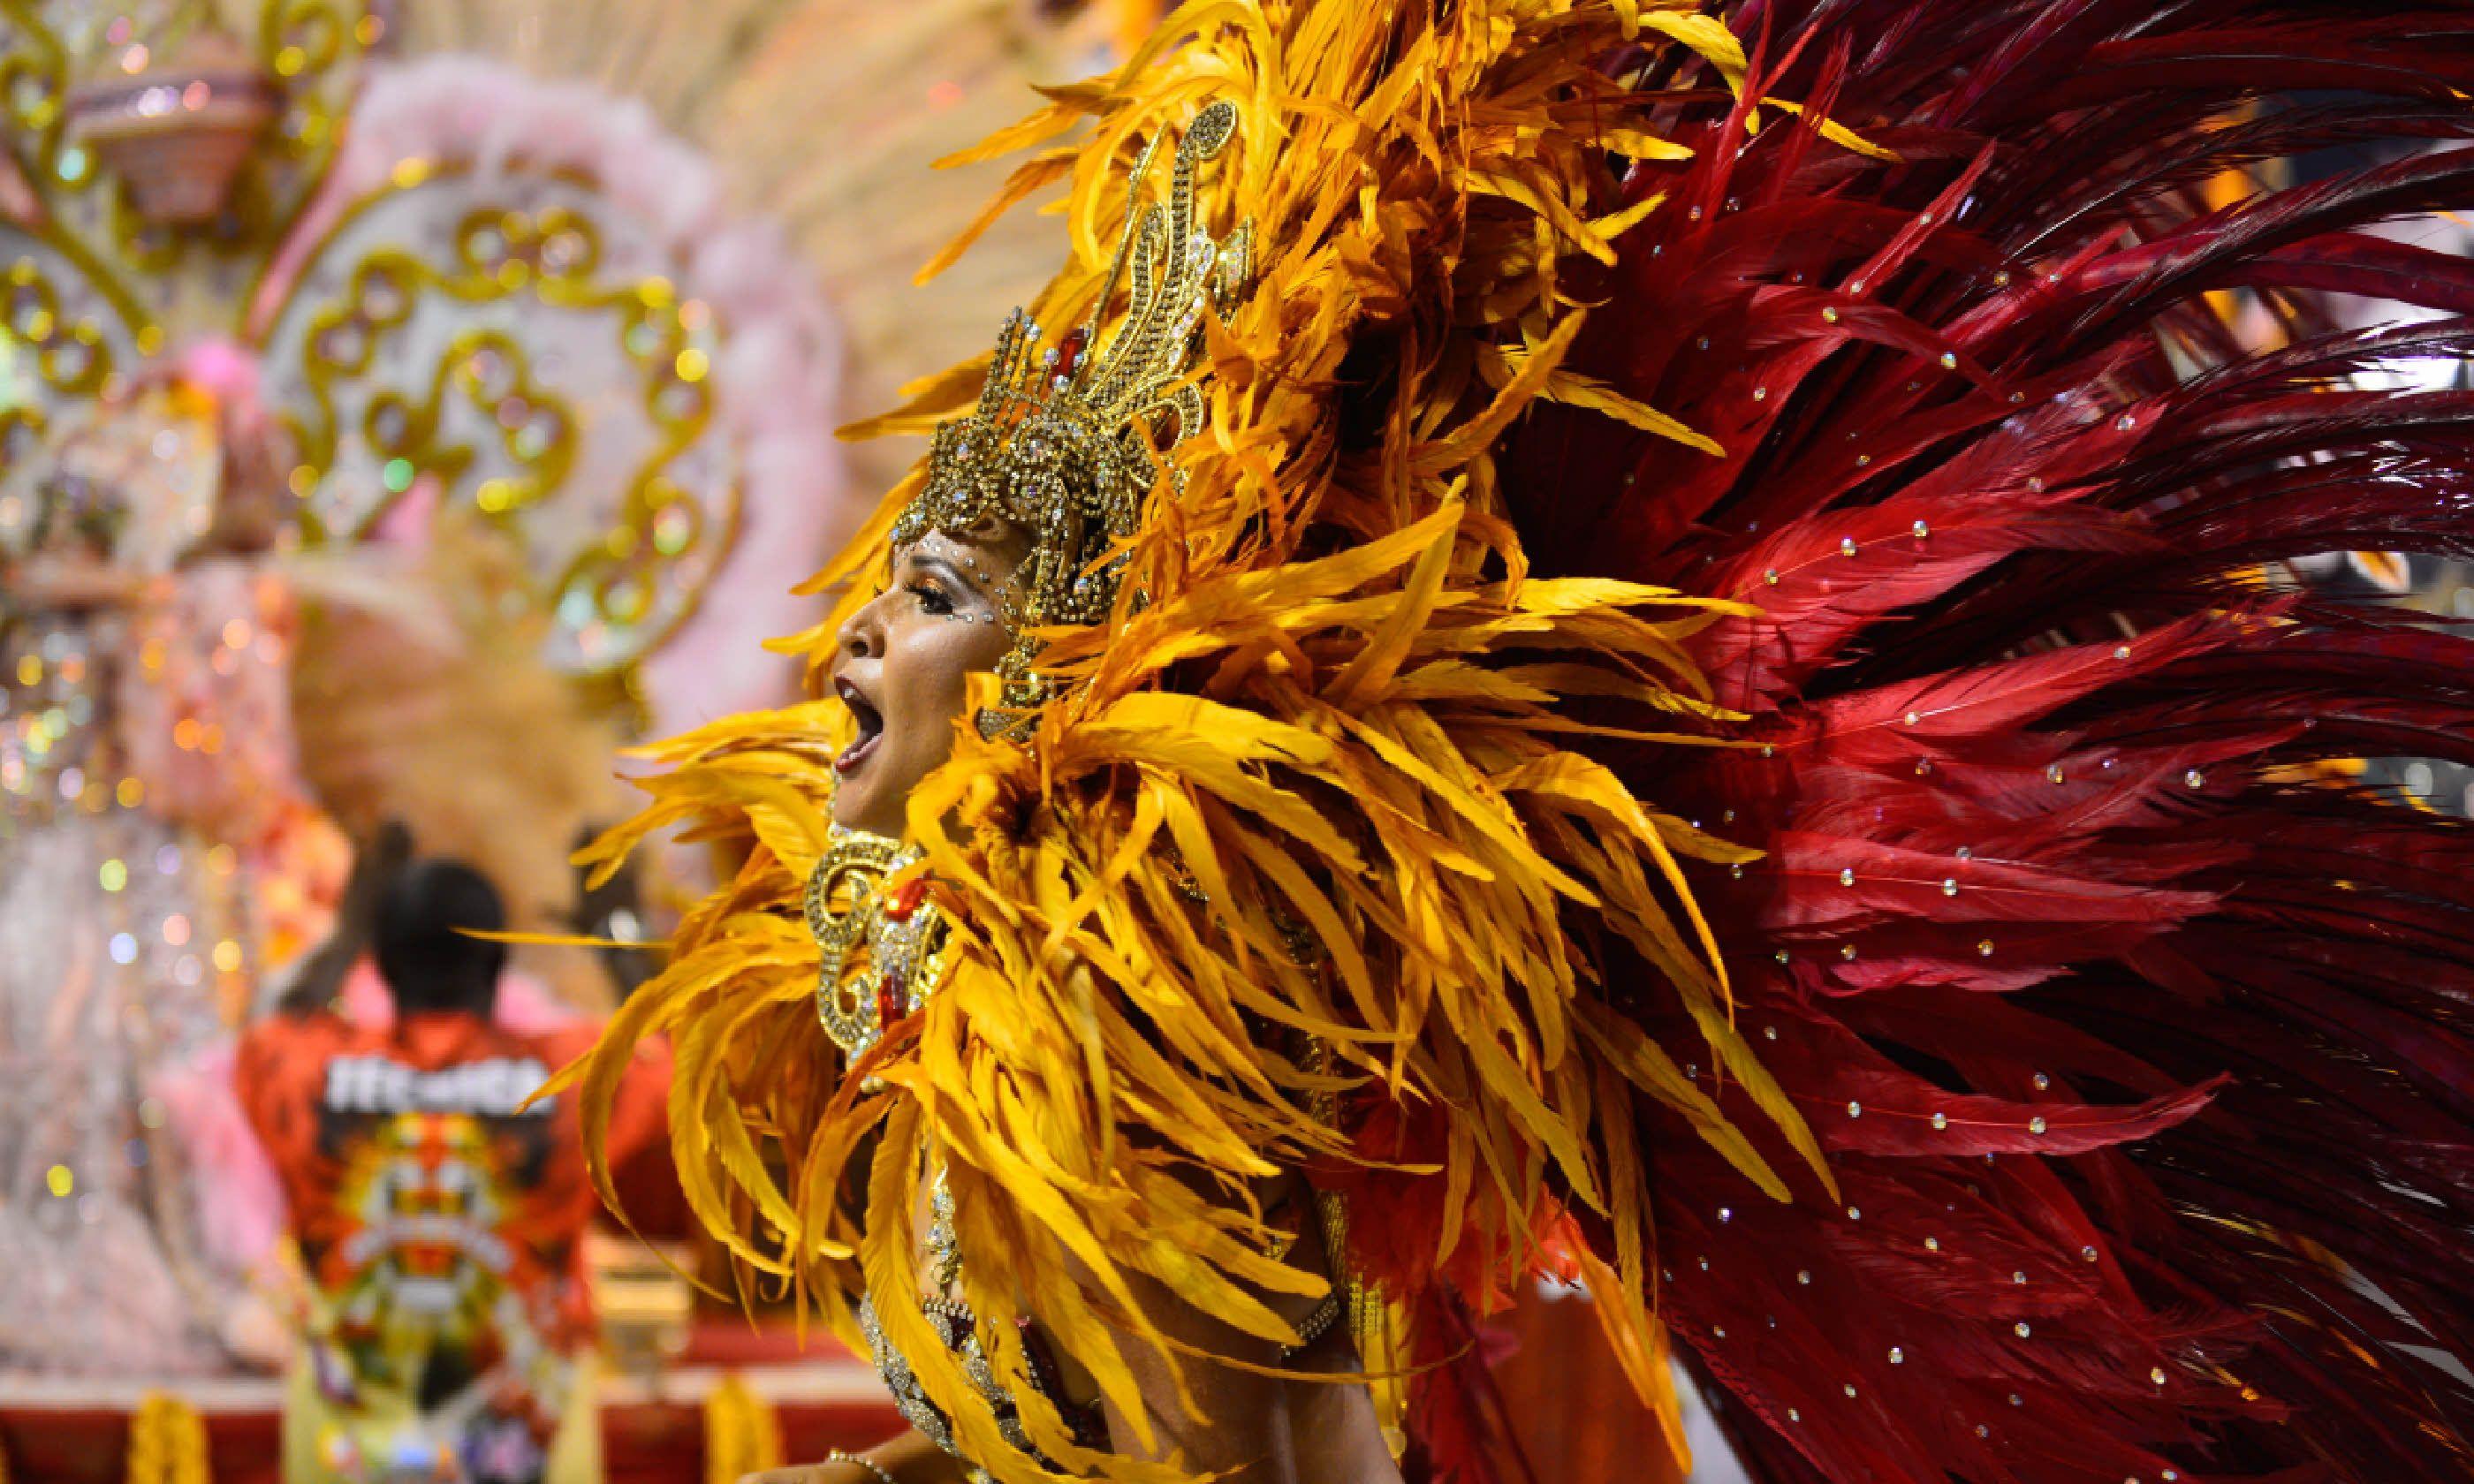 Rio de Janeiro Carnival, Brazil (Shutterstock)